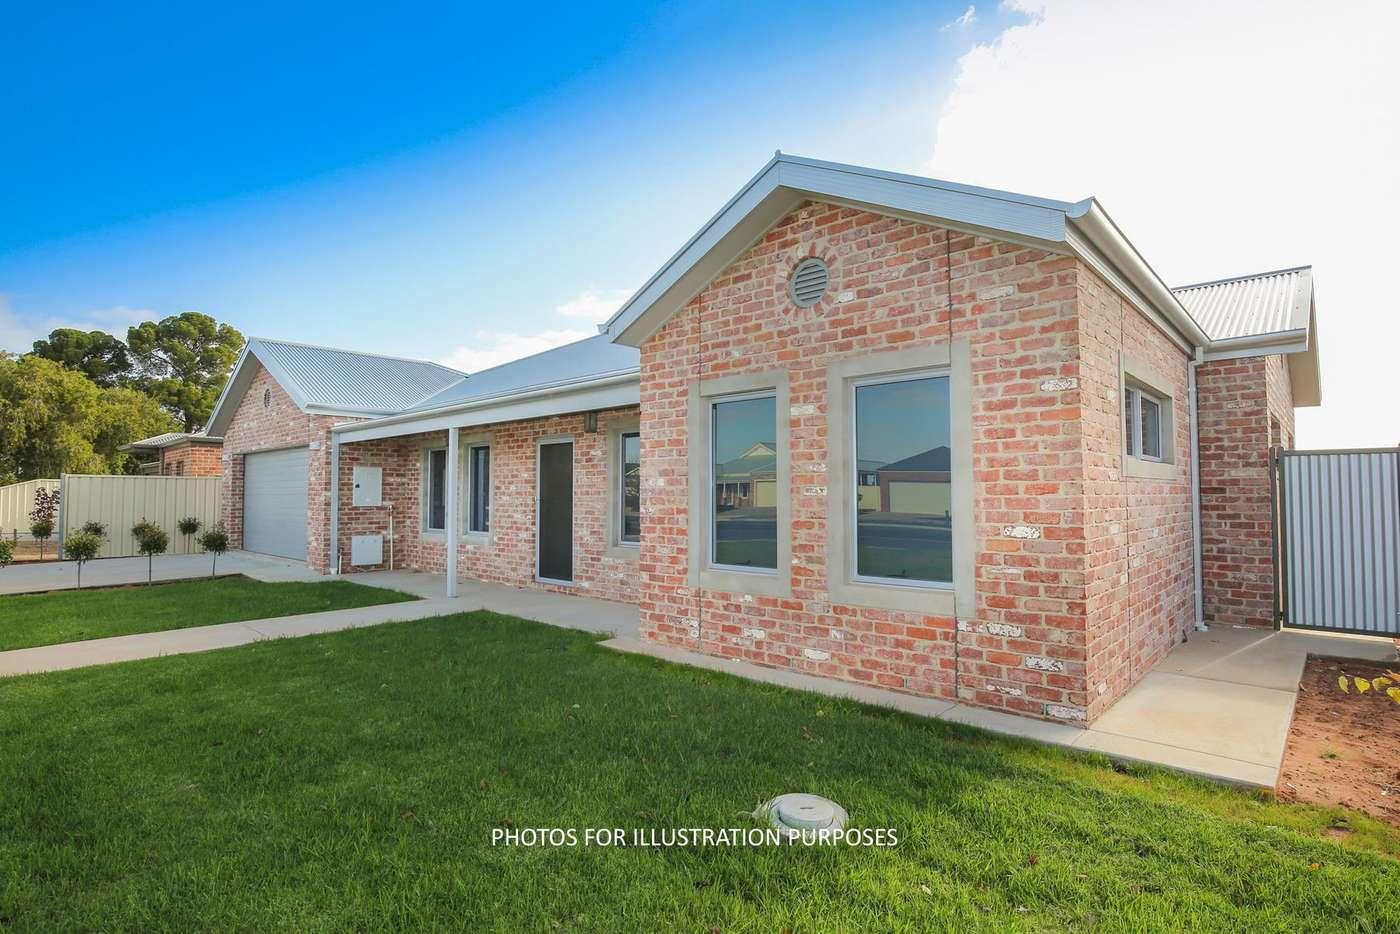 Main view of Homely house listing, 8 Limpidi Drive, Mildura VIC 3500